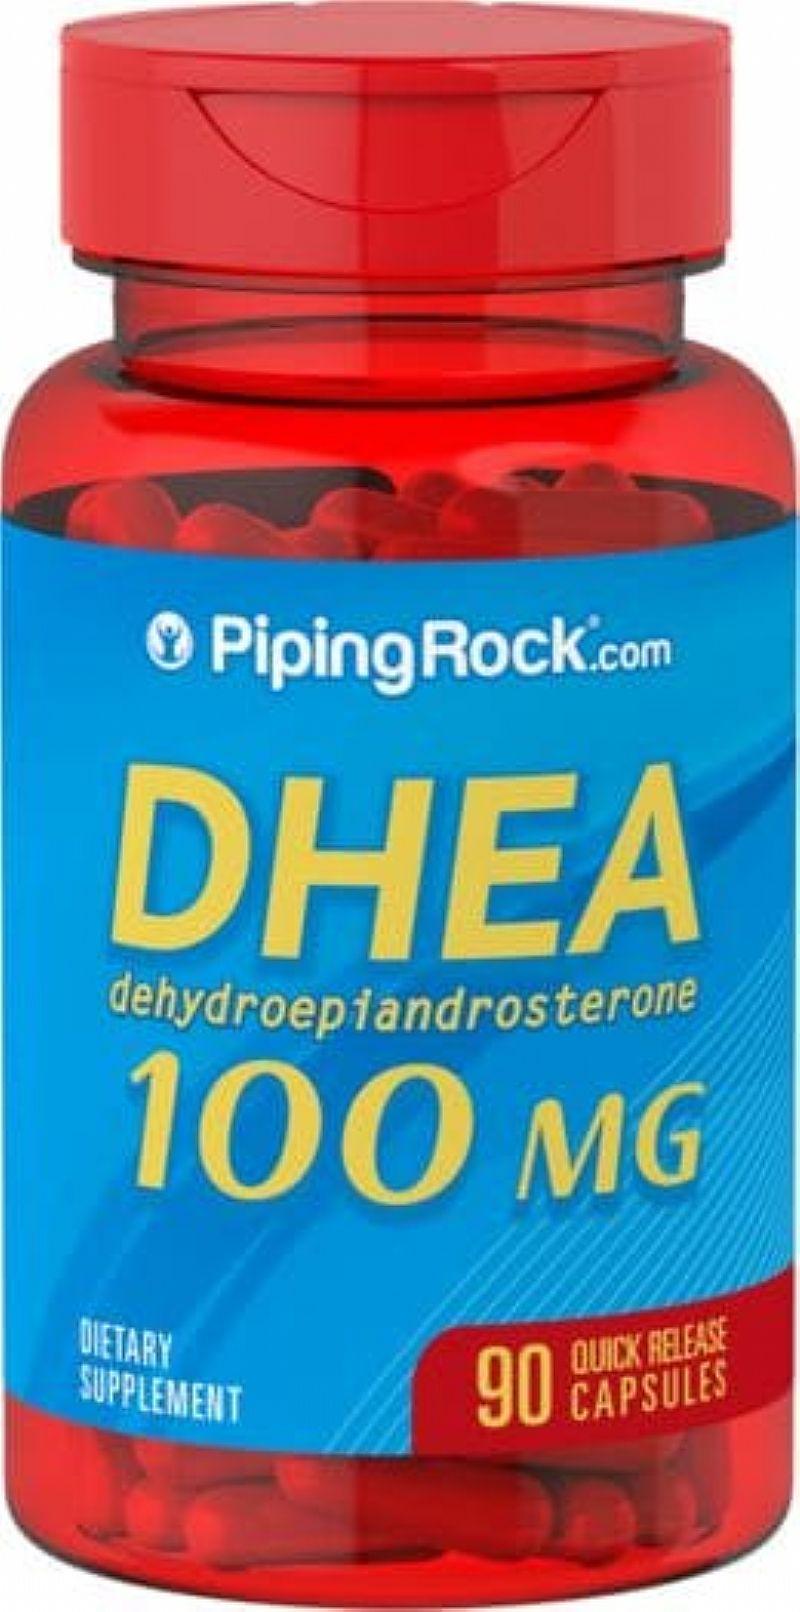 Dhea 100mg 90 caps - recife